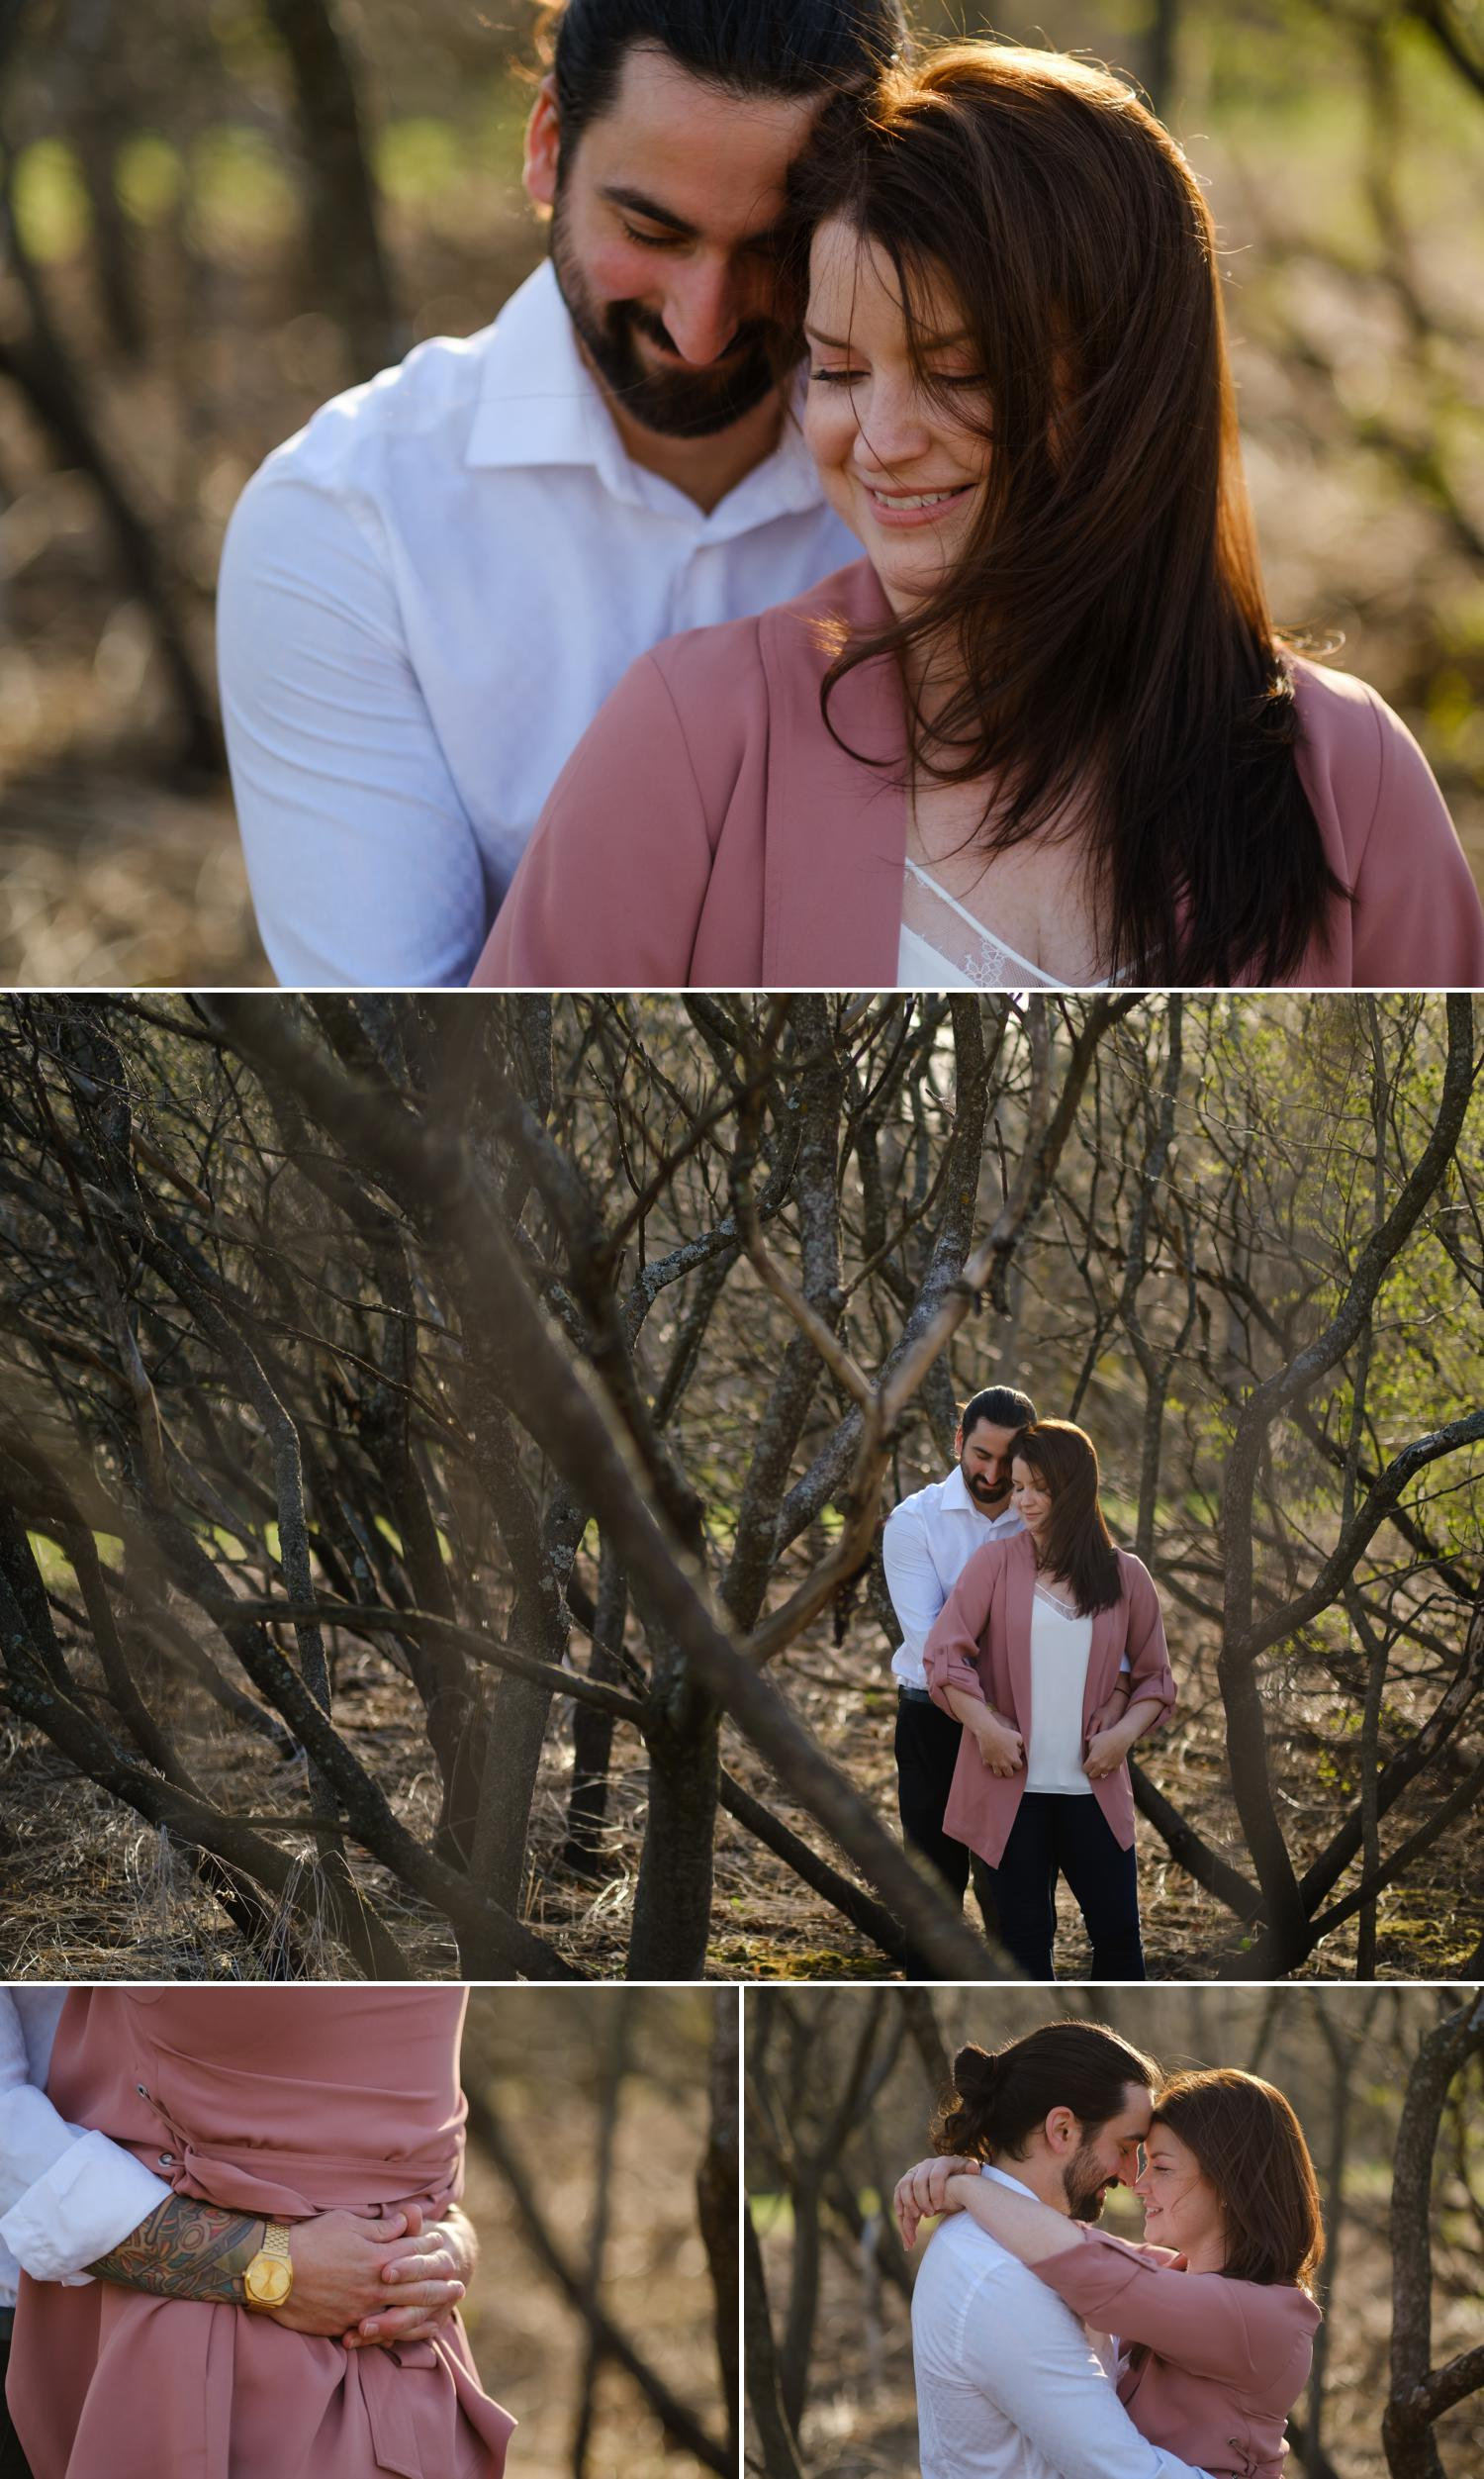 photos of an engaged couple in ottawa ontario